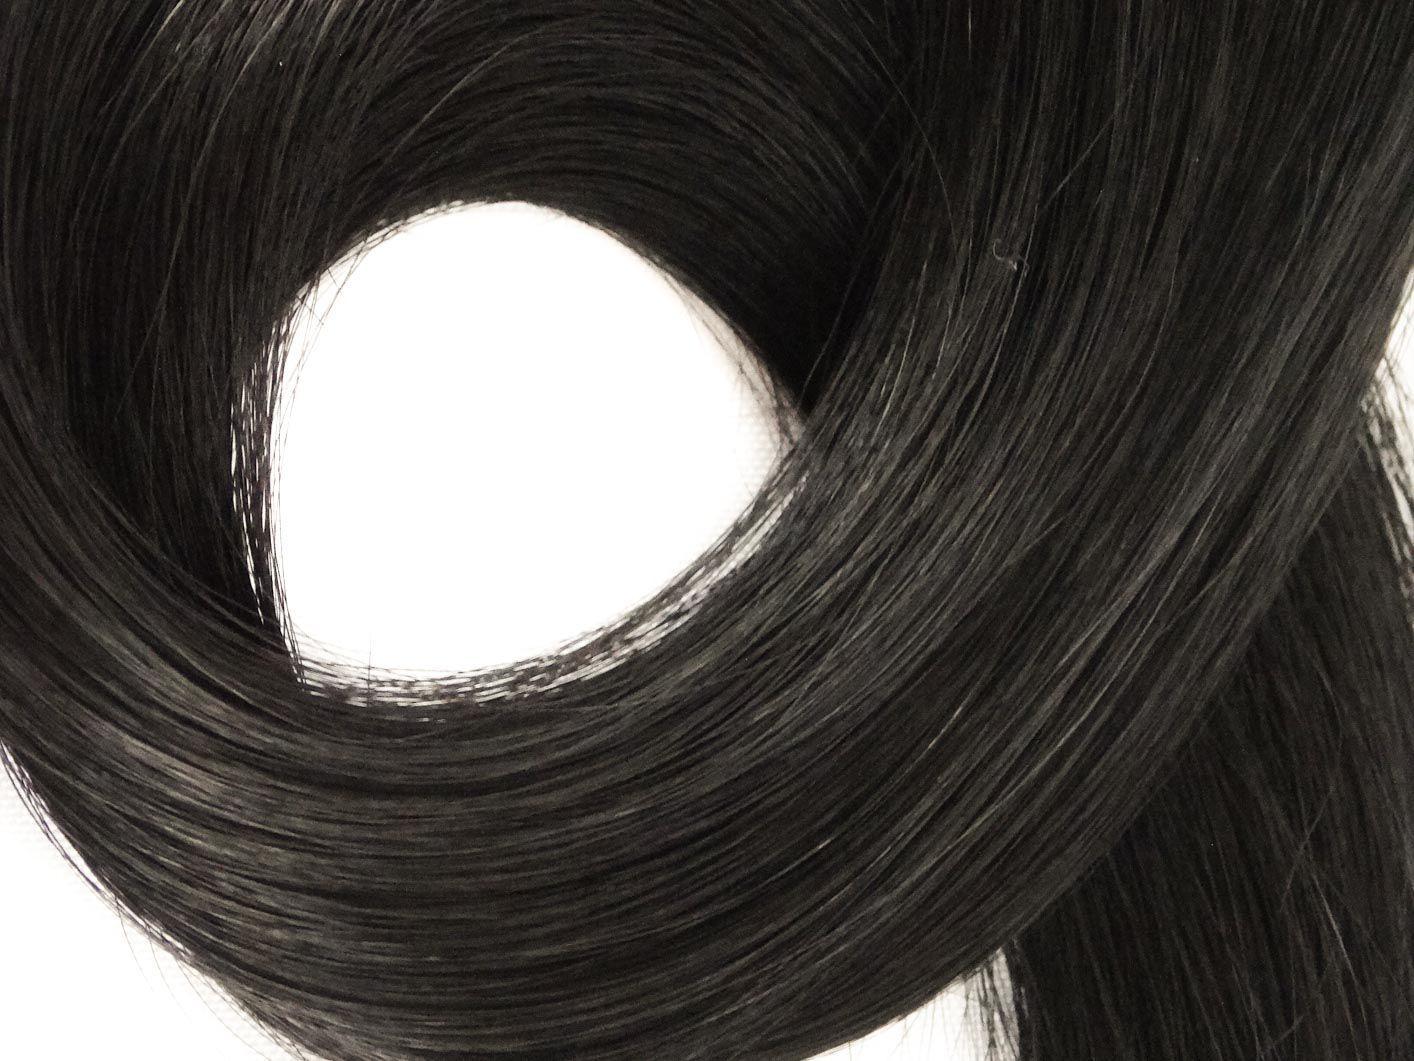 Mega Hair Fita Adesiva Cabelo Humano Premium Preto #1 - 20 peças 35cm 30g